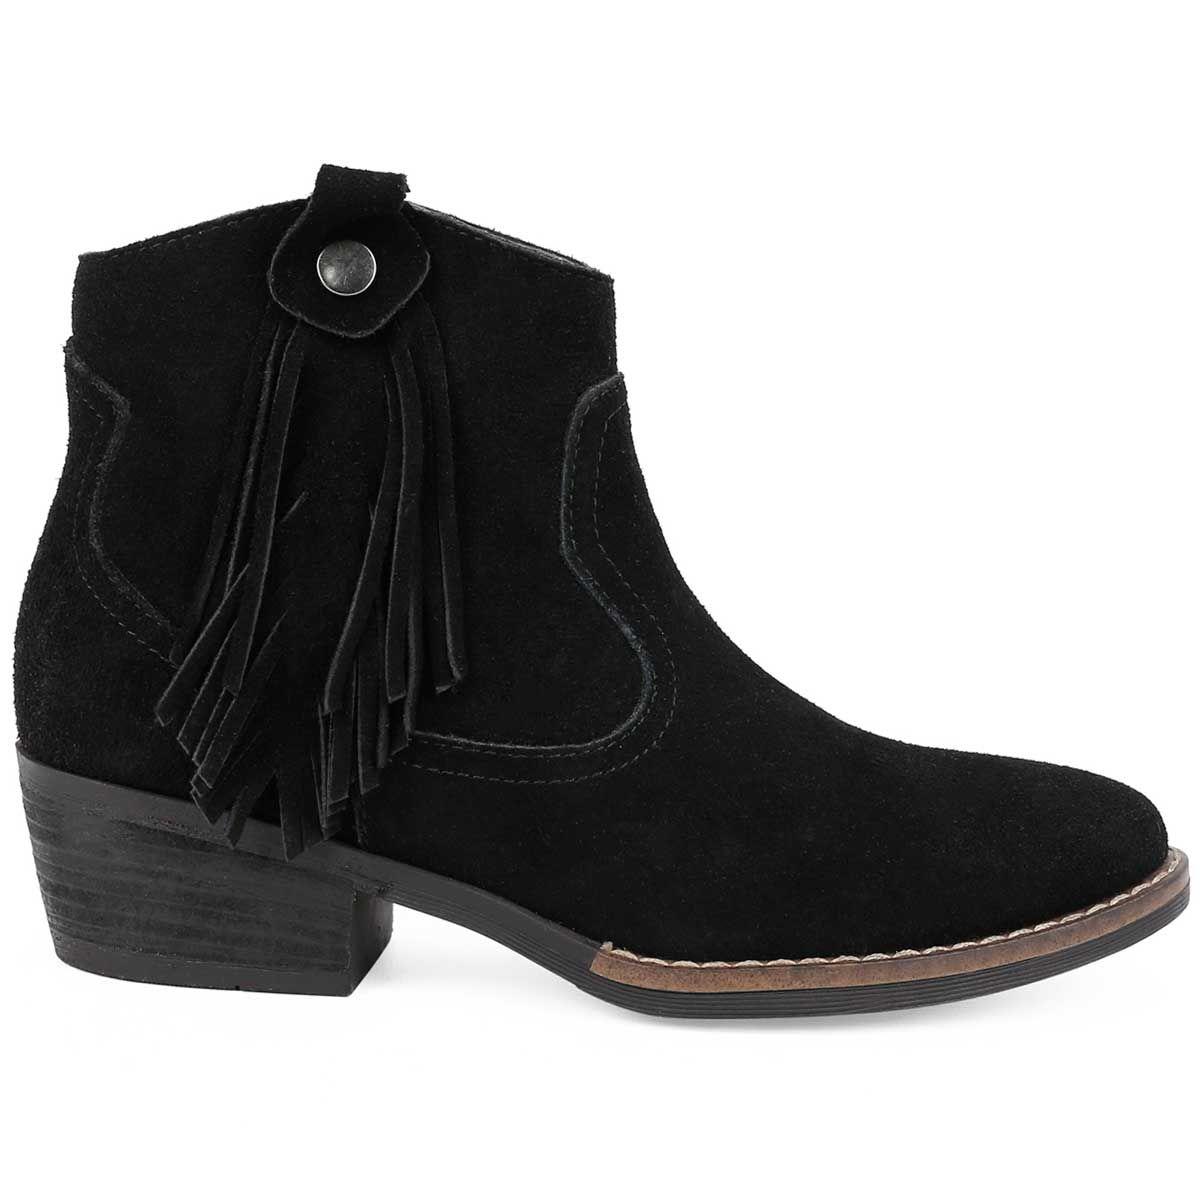 Montevita Flat Western Ankle Boot in Black